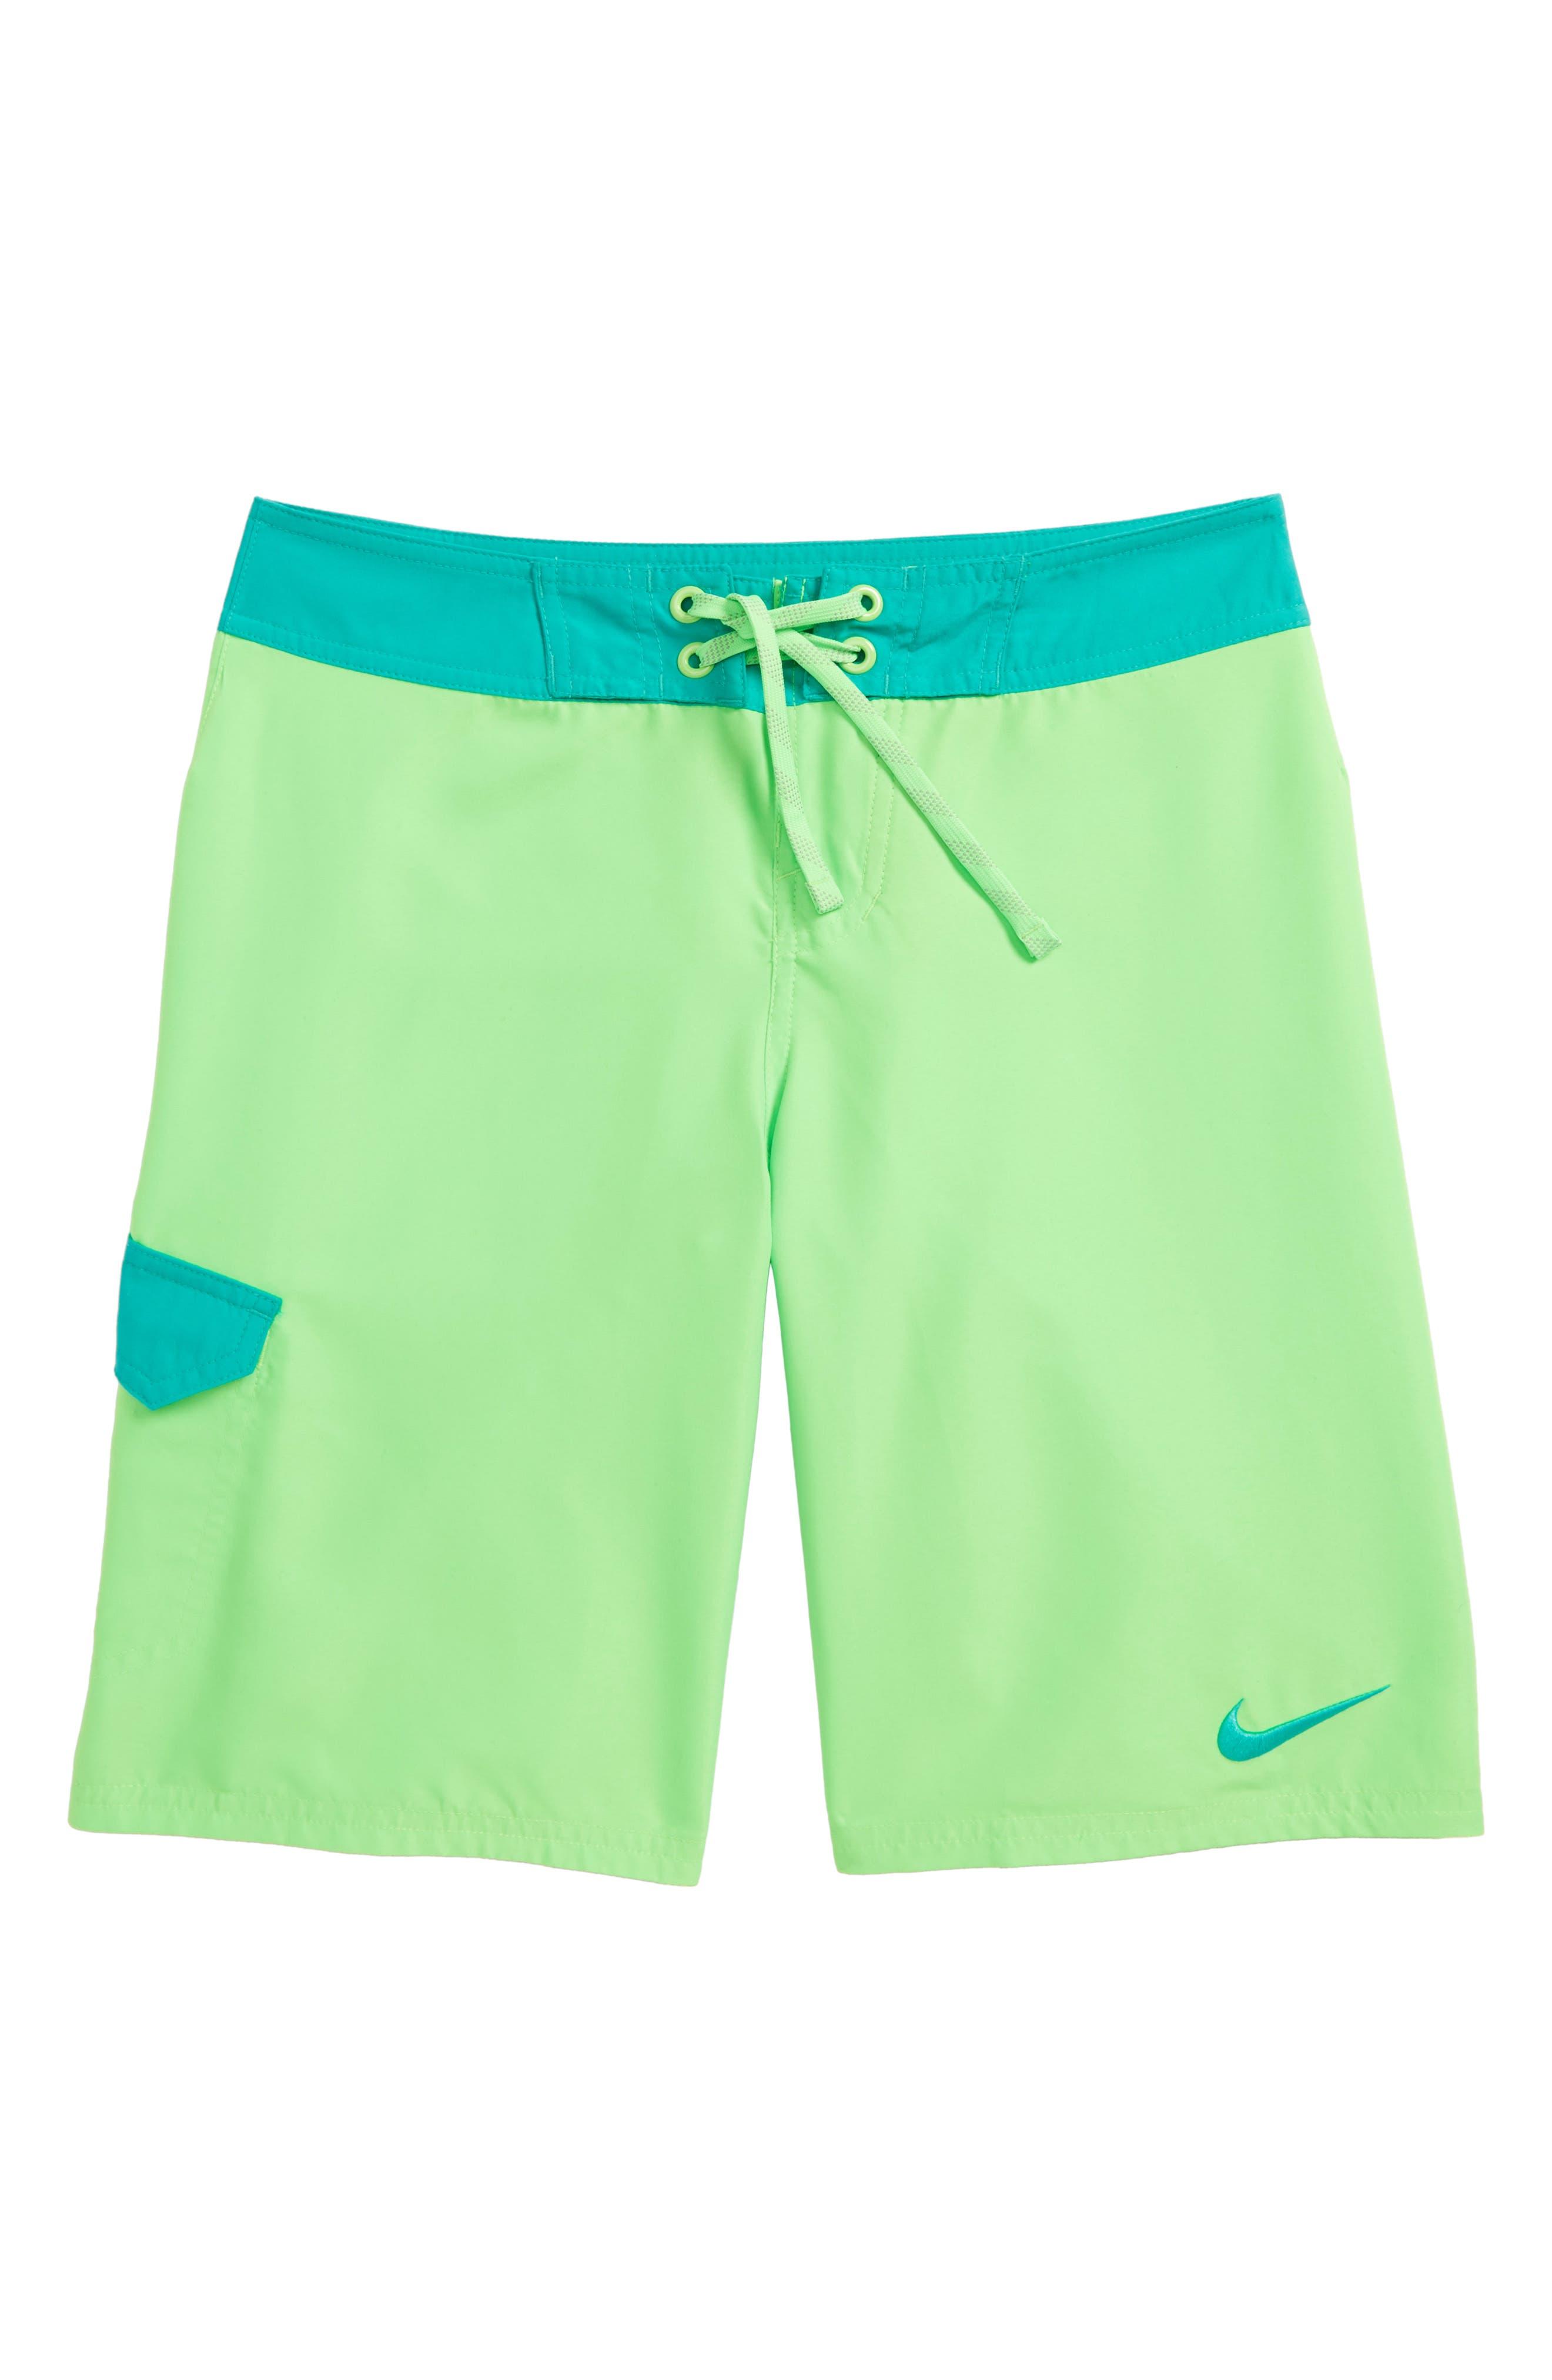 Alternate Image 1 Selected - Nike Drift Board Shorts (Big Boys)